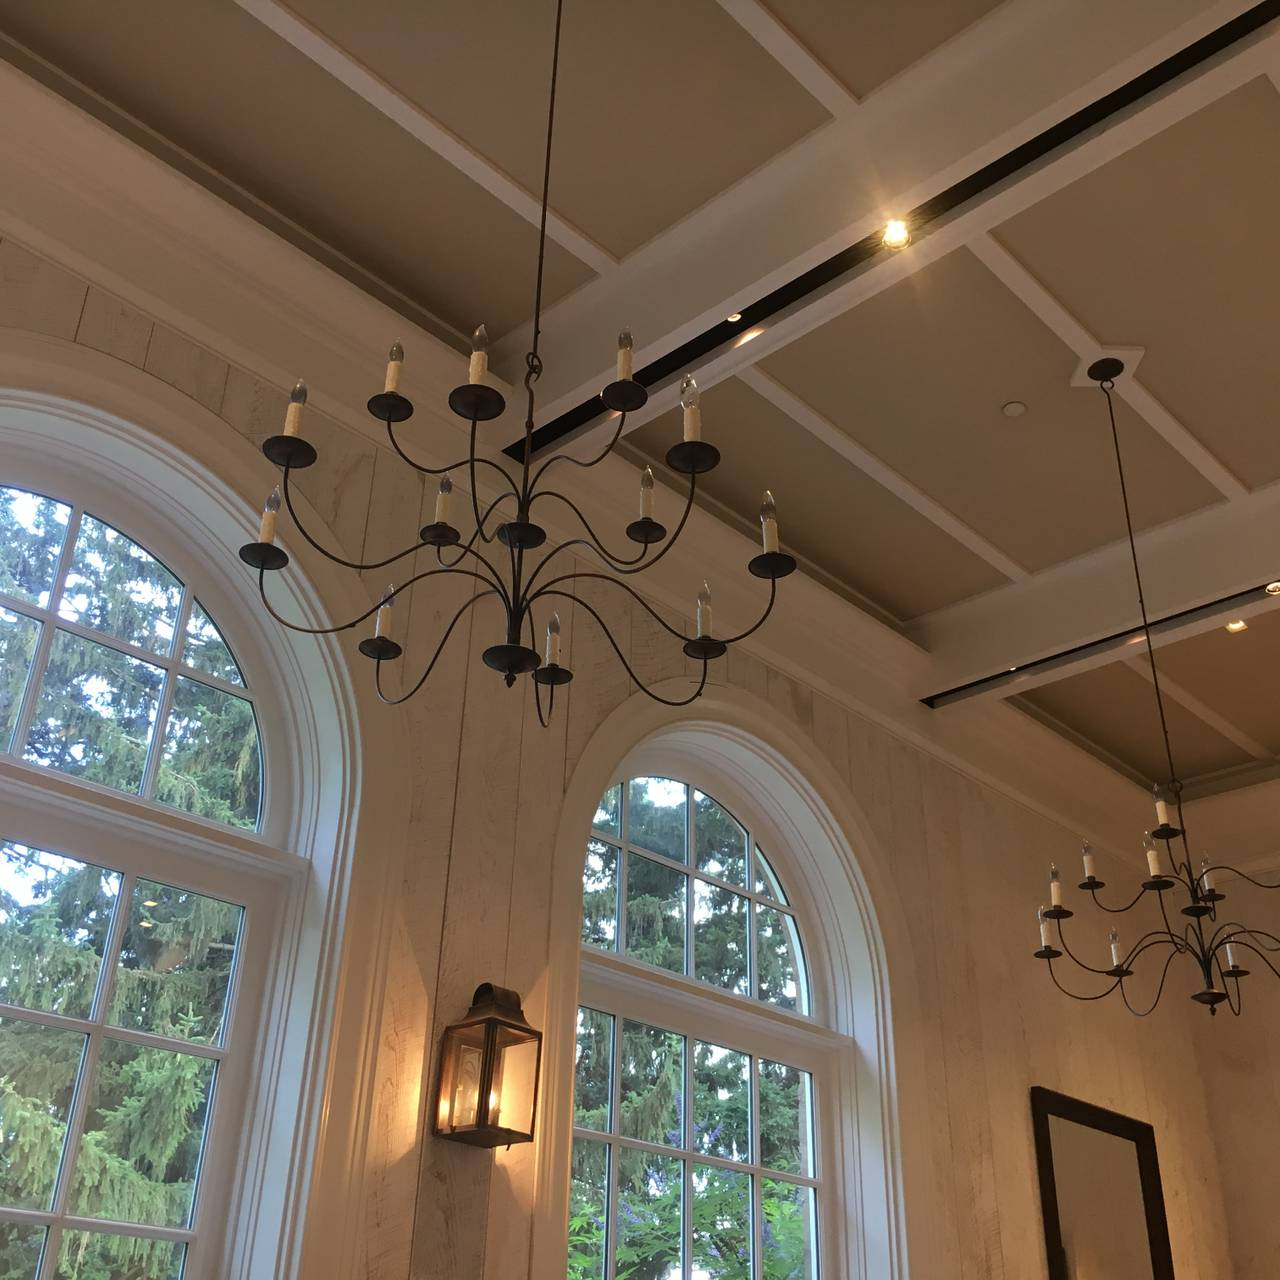 Hudson Garden Grill at the New York Botanical Garden Restaurant ...